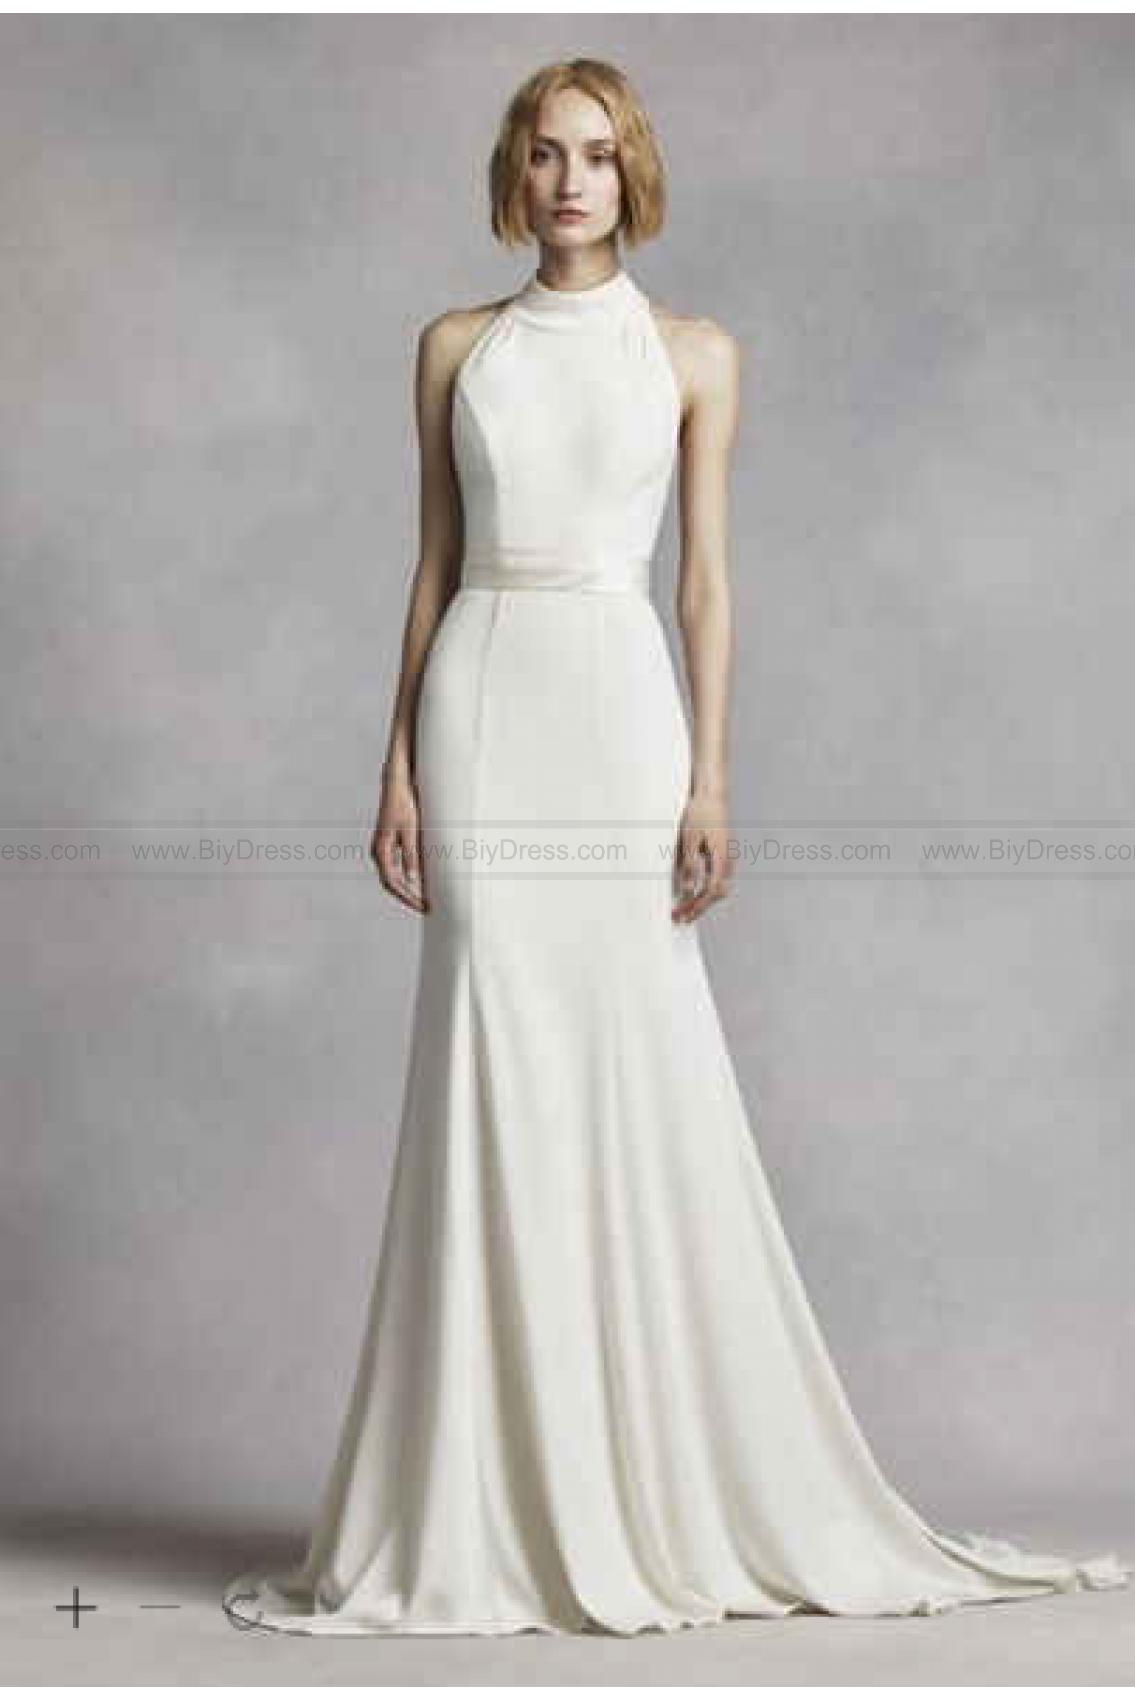 Stunning White by Vera Wang High Neck Halter Wedding Dress VW